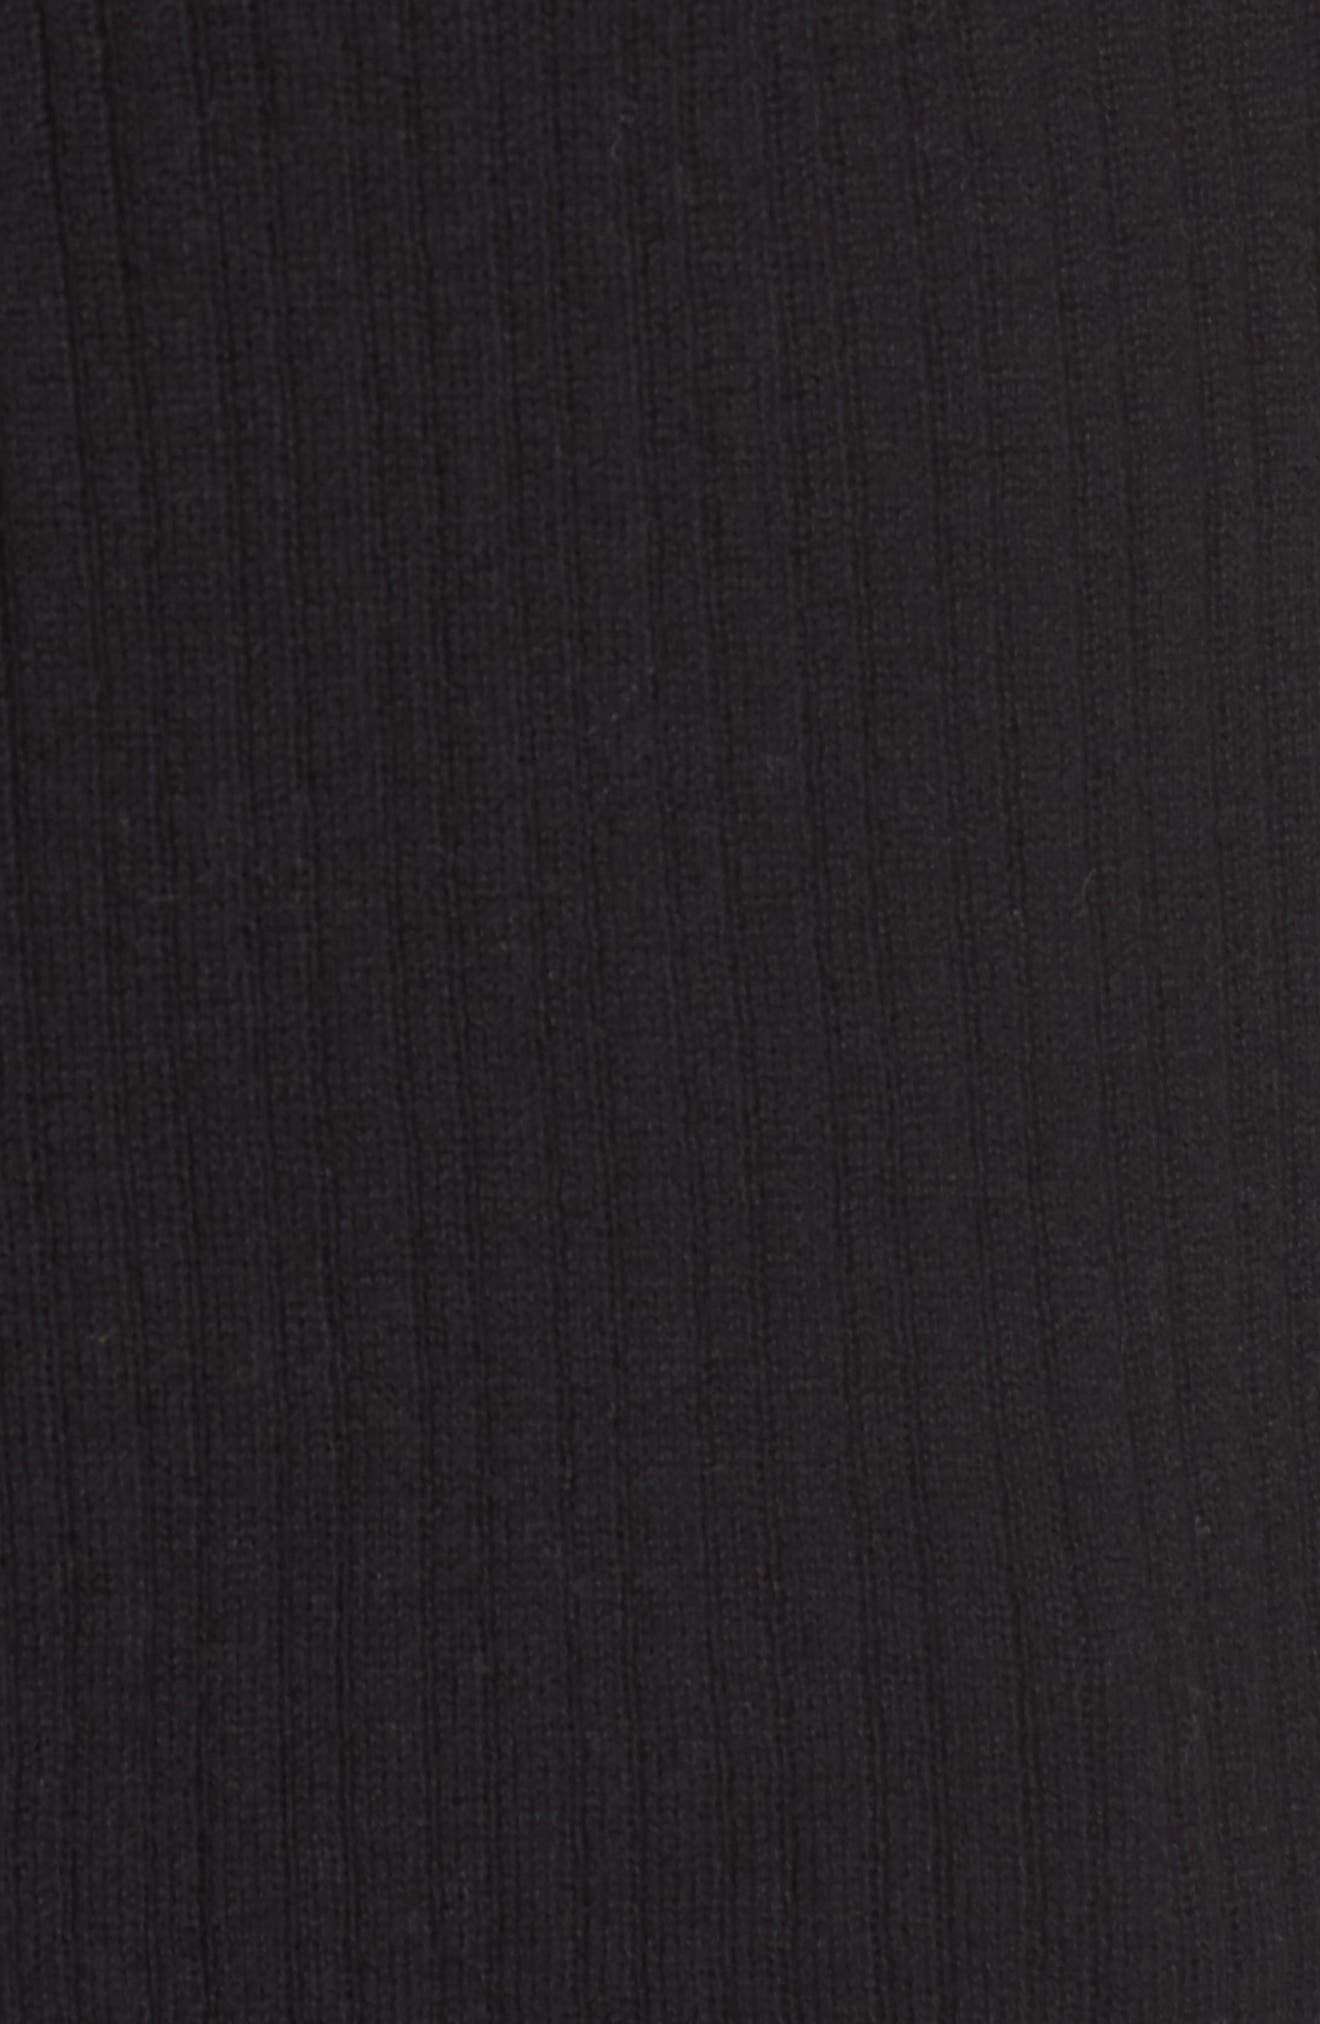 Crewneck Variegated Rib-Knit Sweater,                             Alternate thumbnail 13, color,